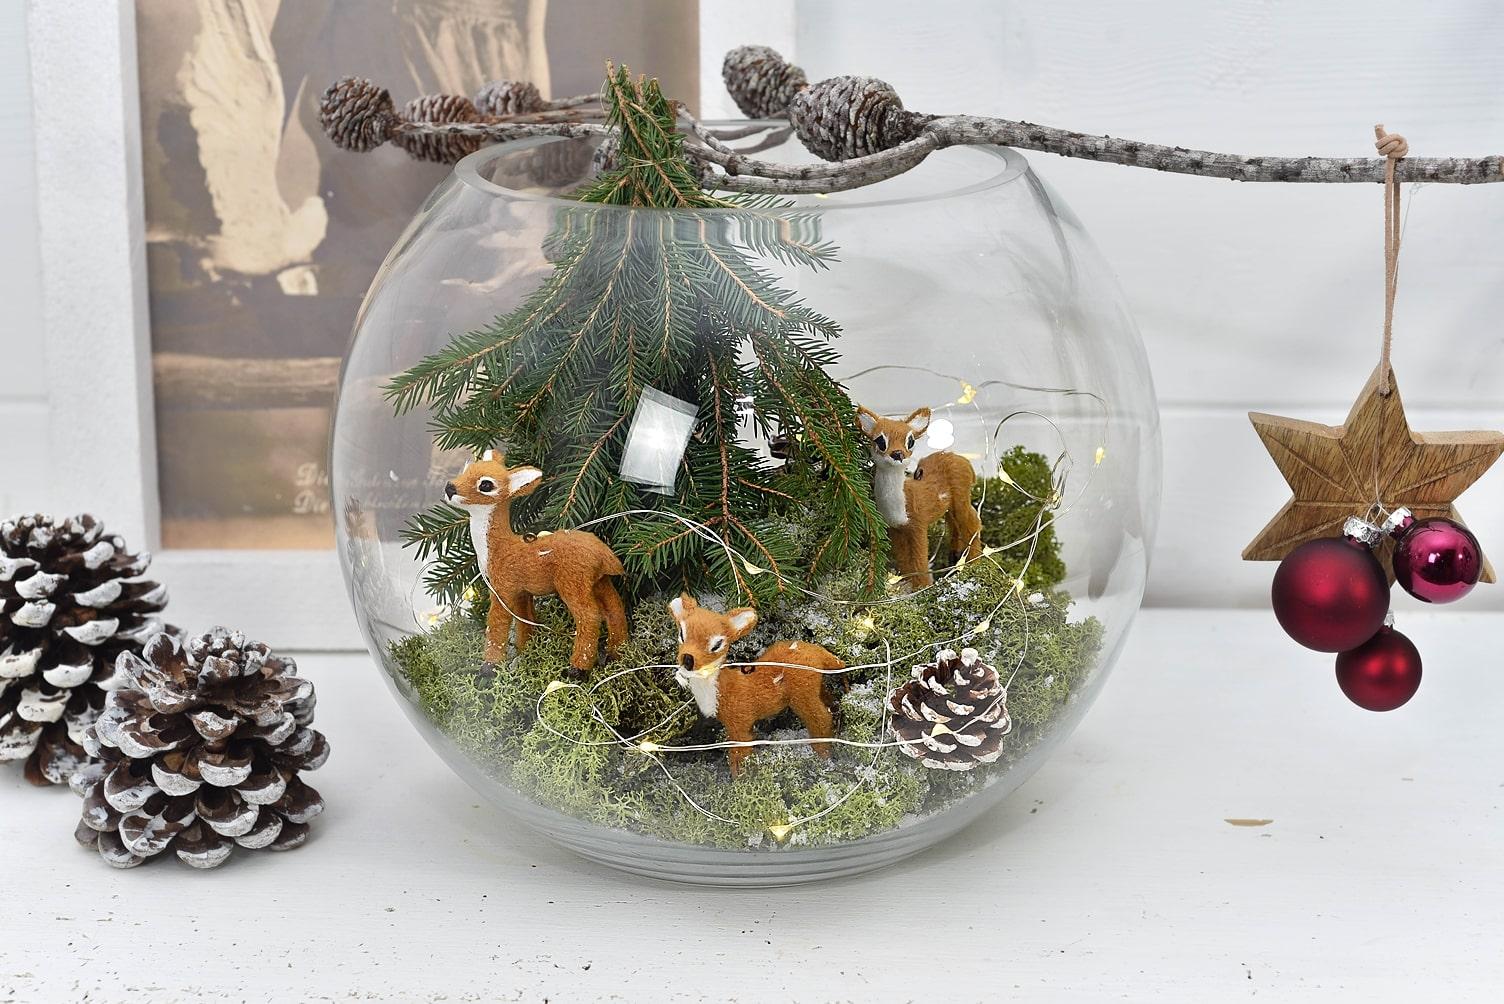 Weihnachtsdekoa aus Naturmaterialien.